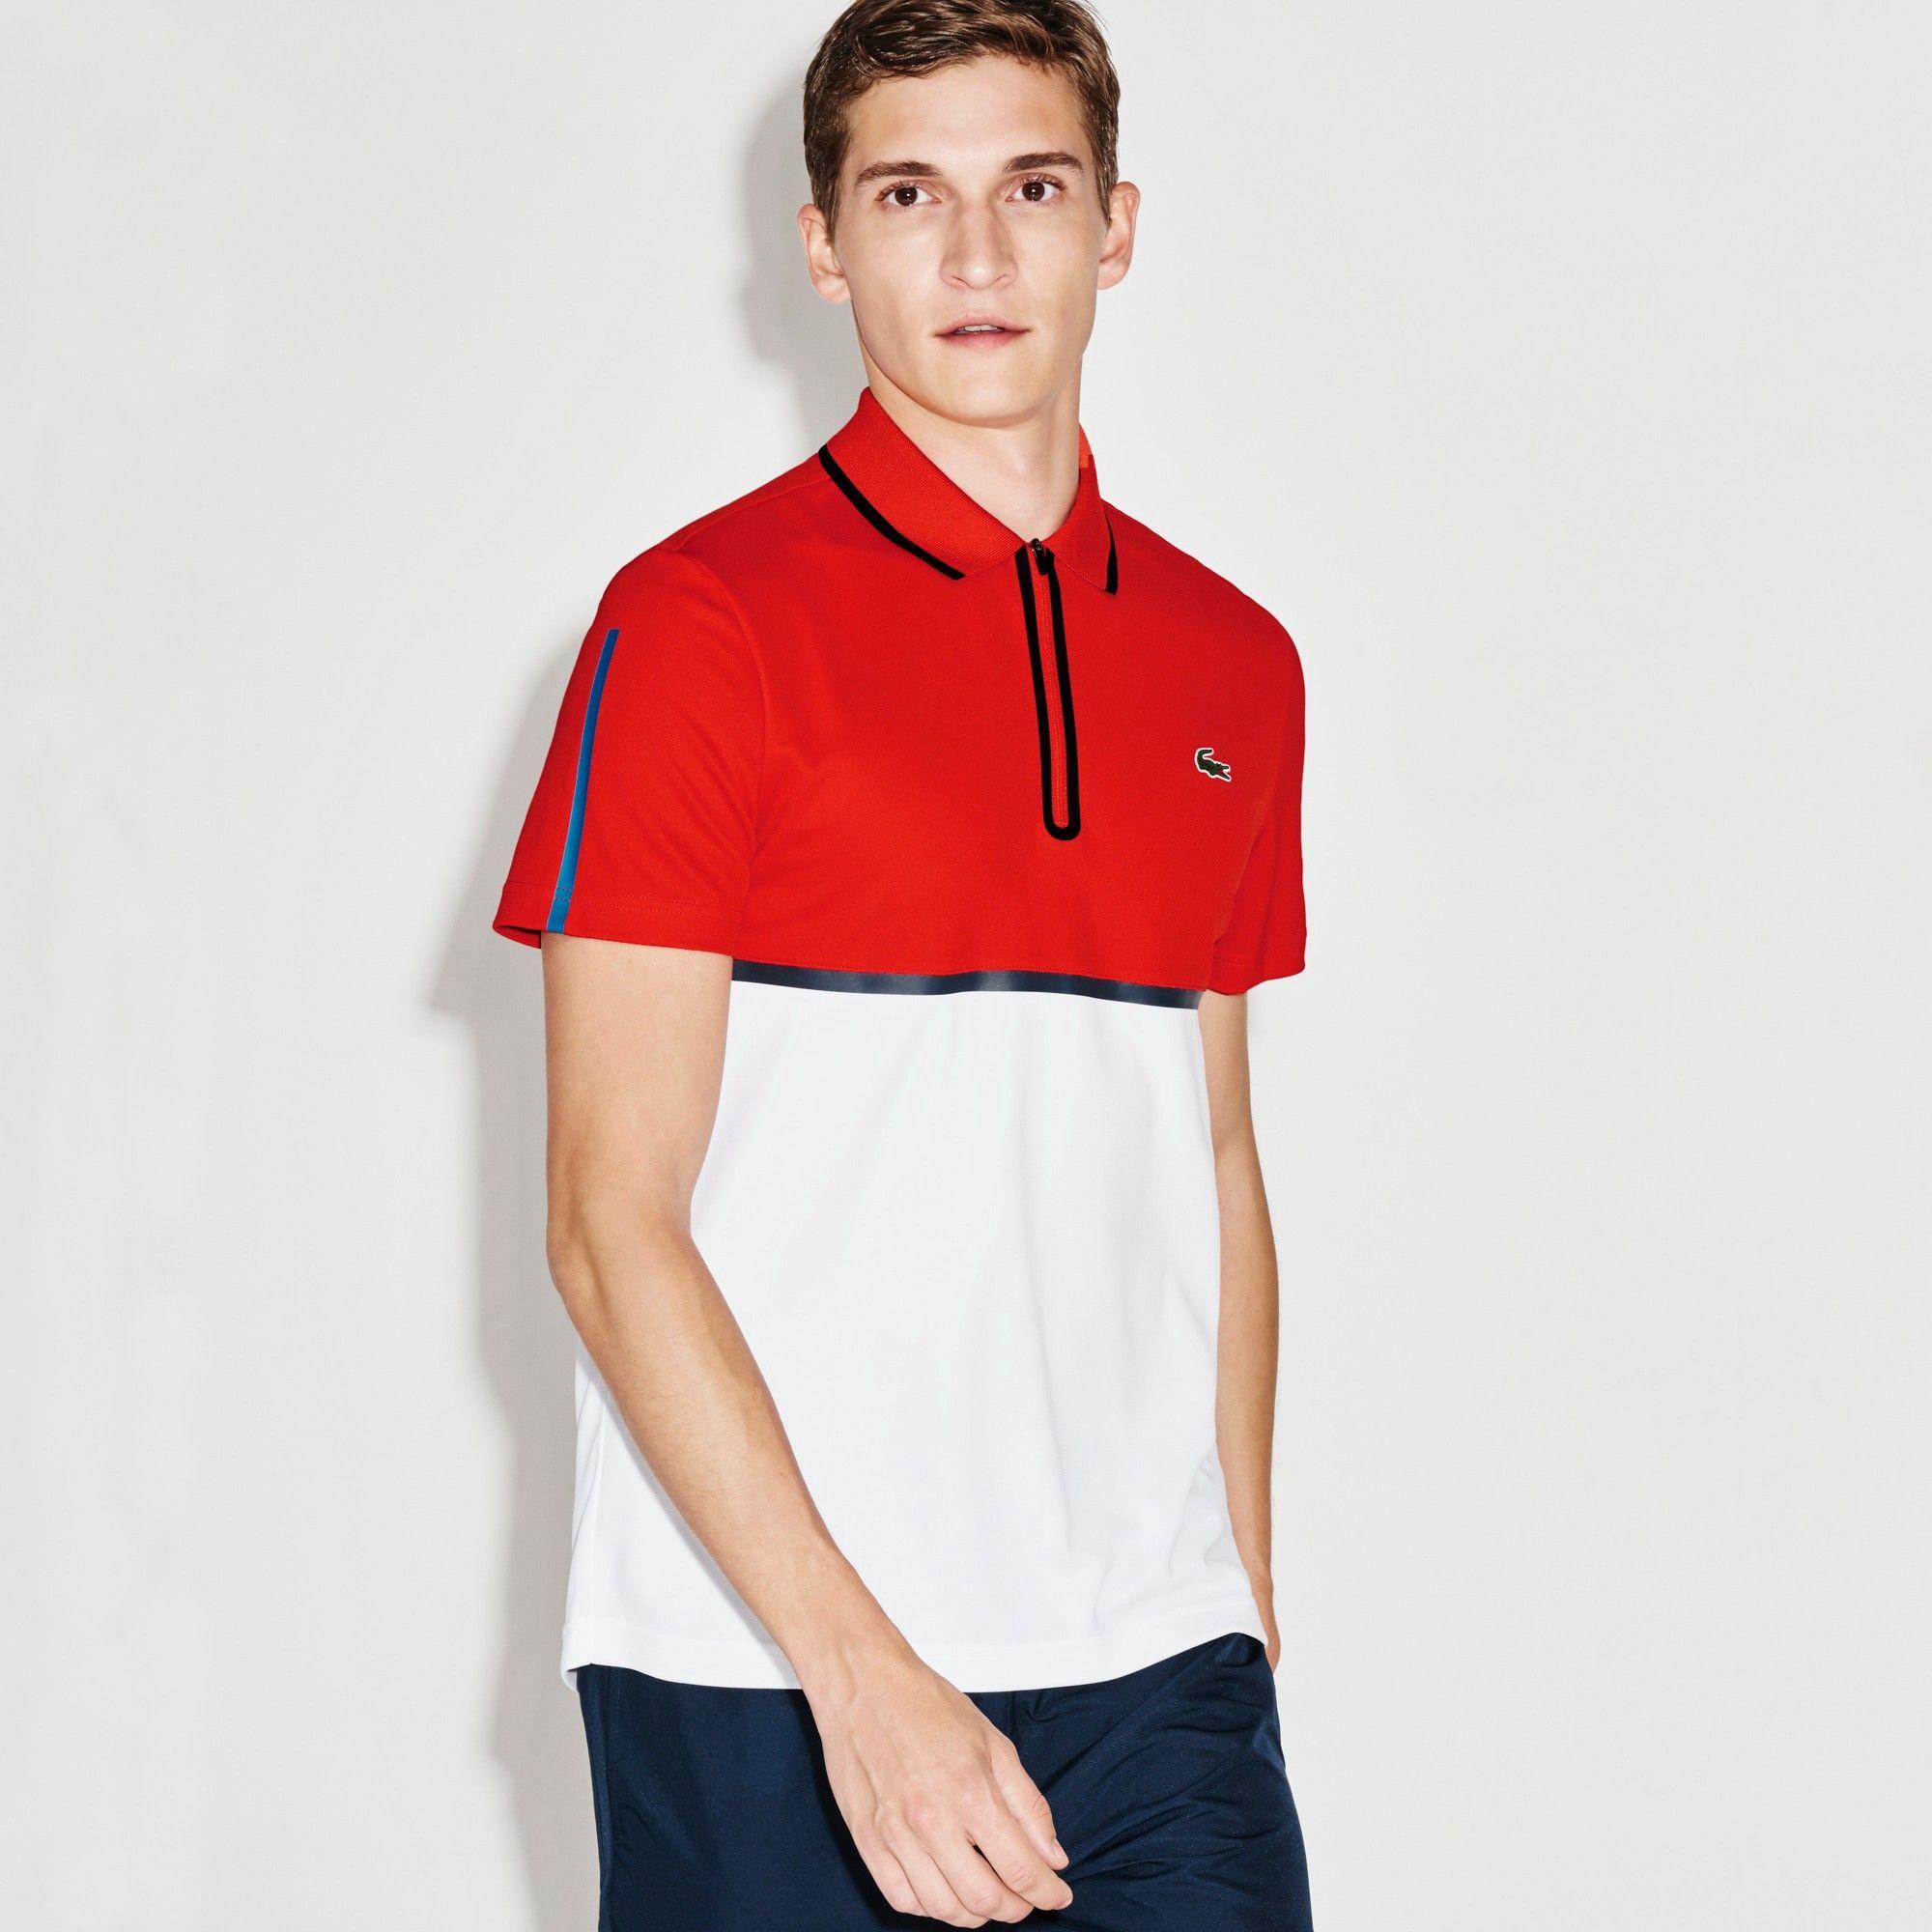 Lacoste Men S Sport Ultra Dry Zip Pique Knit Tennis Polo Shirt Etna Red White Navy Blue Modesens Lacoste Men Tennis Polo Polo Shirt